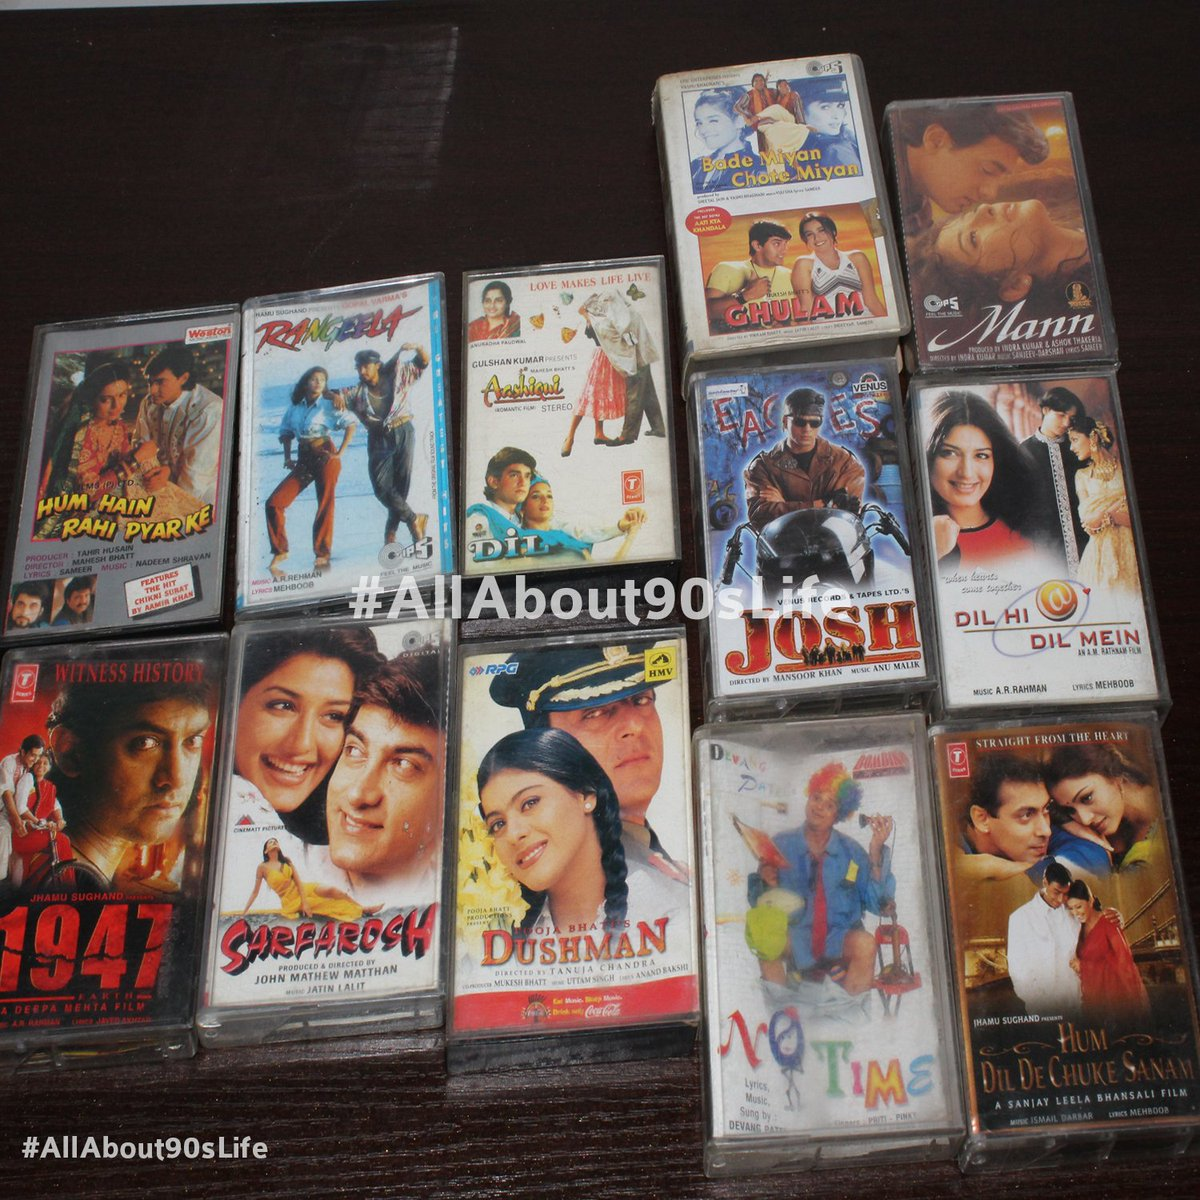 treat for @aamir_khan @itsKajolD @iamsrk @iam_juhi @BeingSalmanKhan @MadhuriDixit @iamsonalibendre @duttsanjay  fans here..   #AllAbout90sLife #90s #90slove #90sNostalgia #AishwaryaRaiBachchan pic.twitter.com/imQZi05BWh